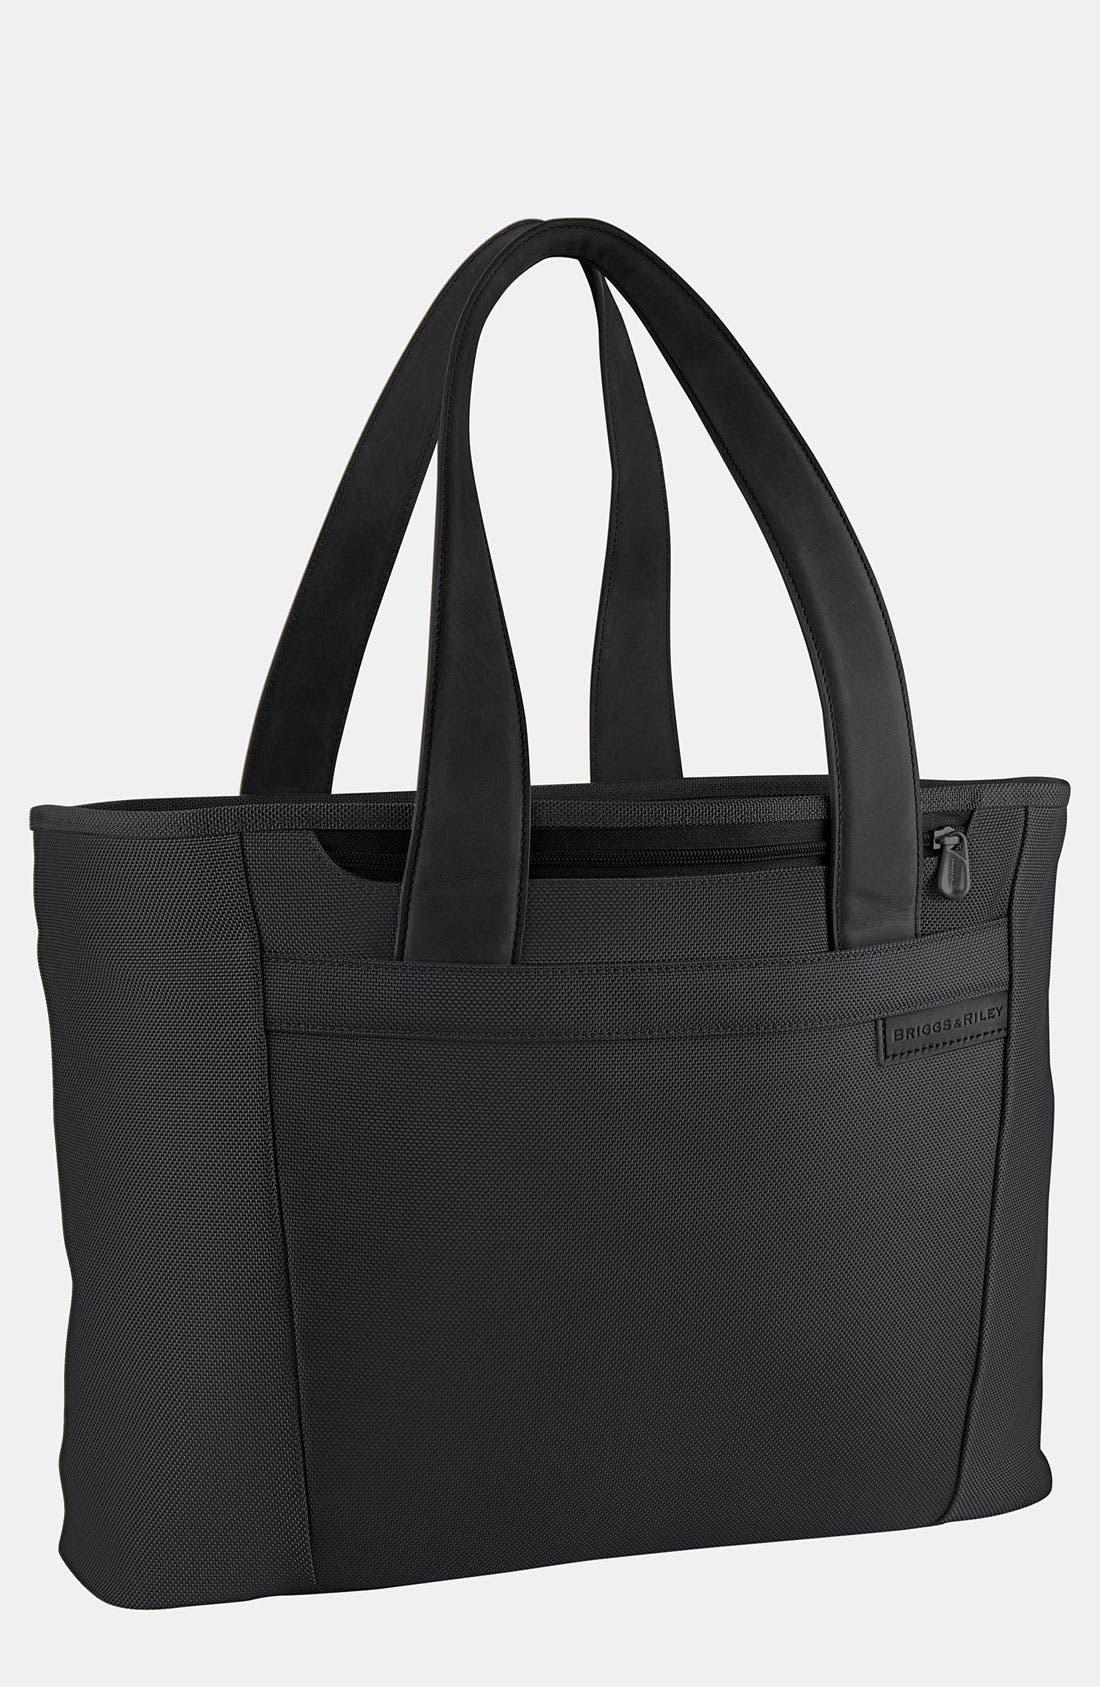 BRIGGS & RILEY,                             'Large Baseline' Shopping Tote,                             Main thumbnail 1, color,                             BLACK